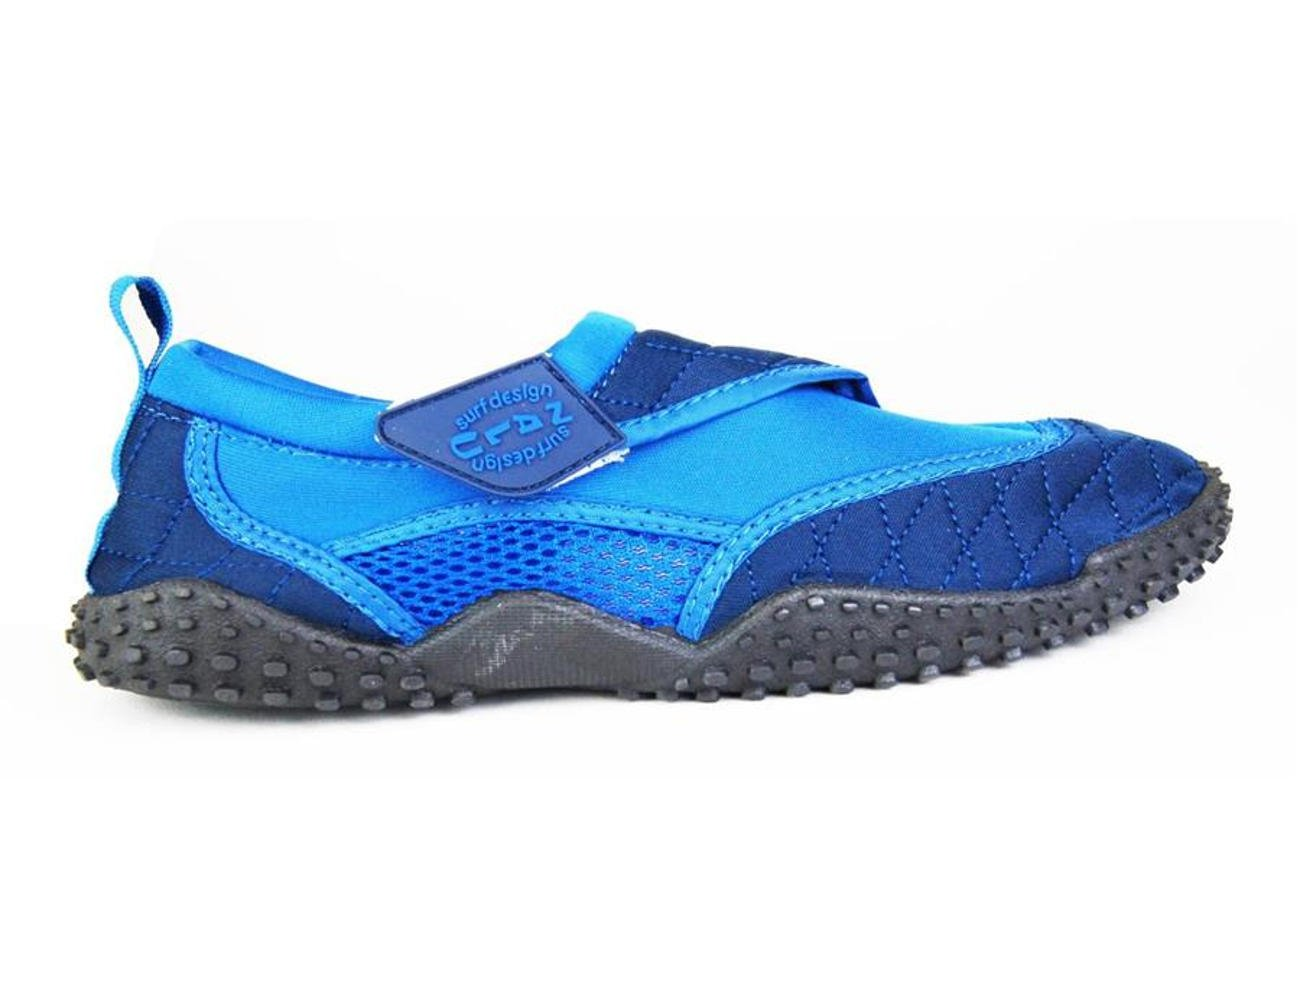 Nalu Velcro Aqua Combinaison de plongée Chaussures Enfant Tailles UK5 - UK9 Kandy Toys